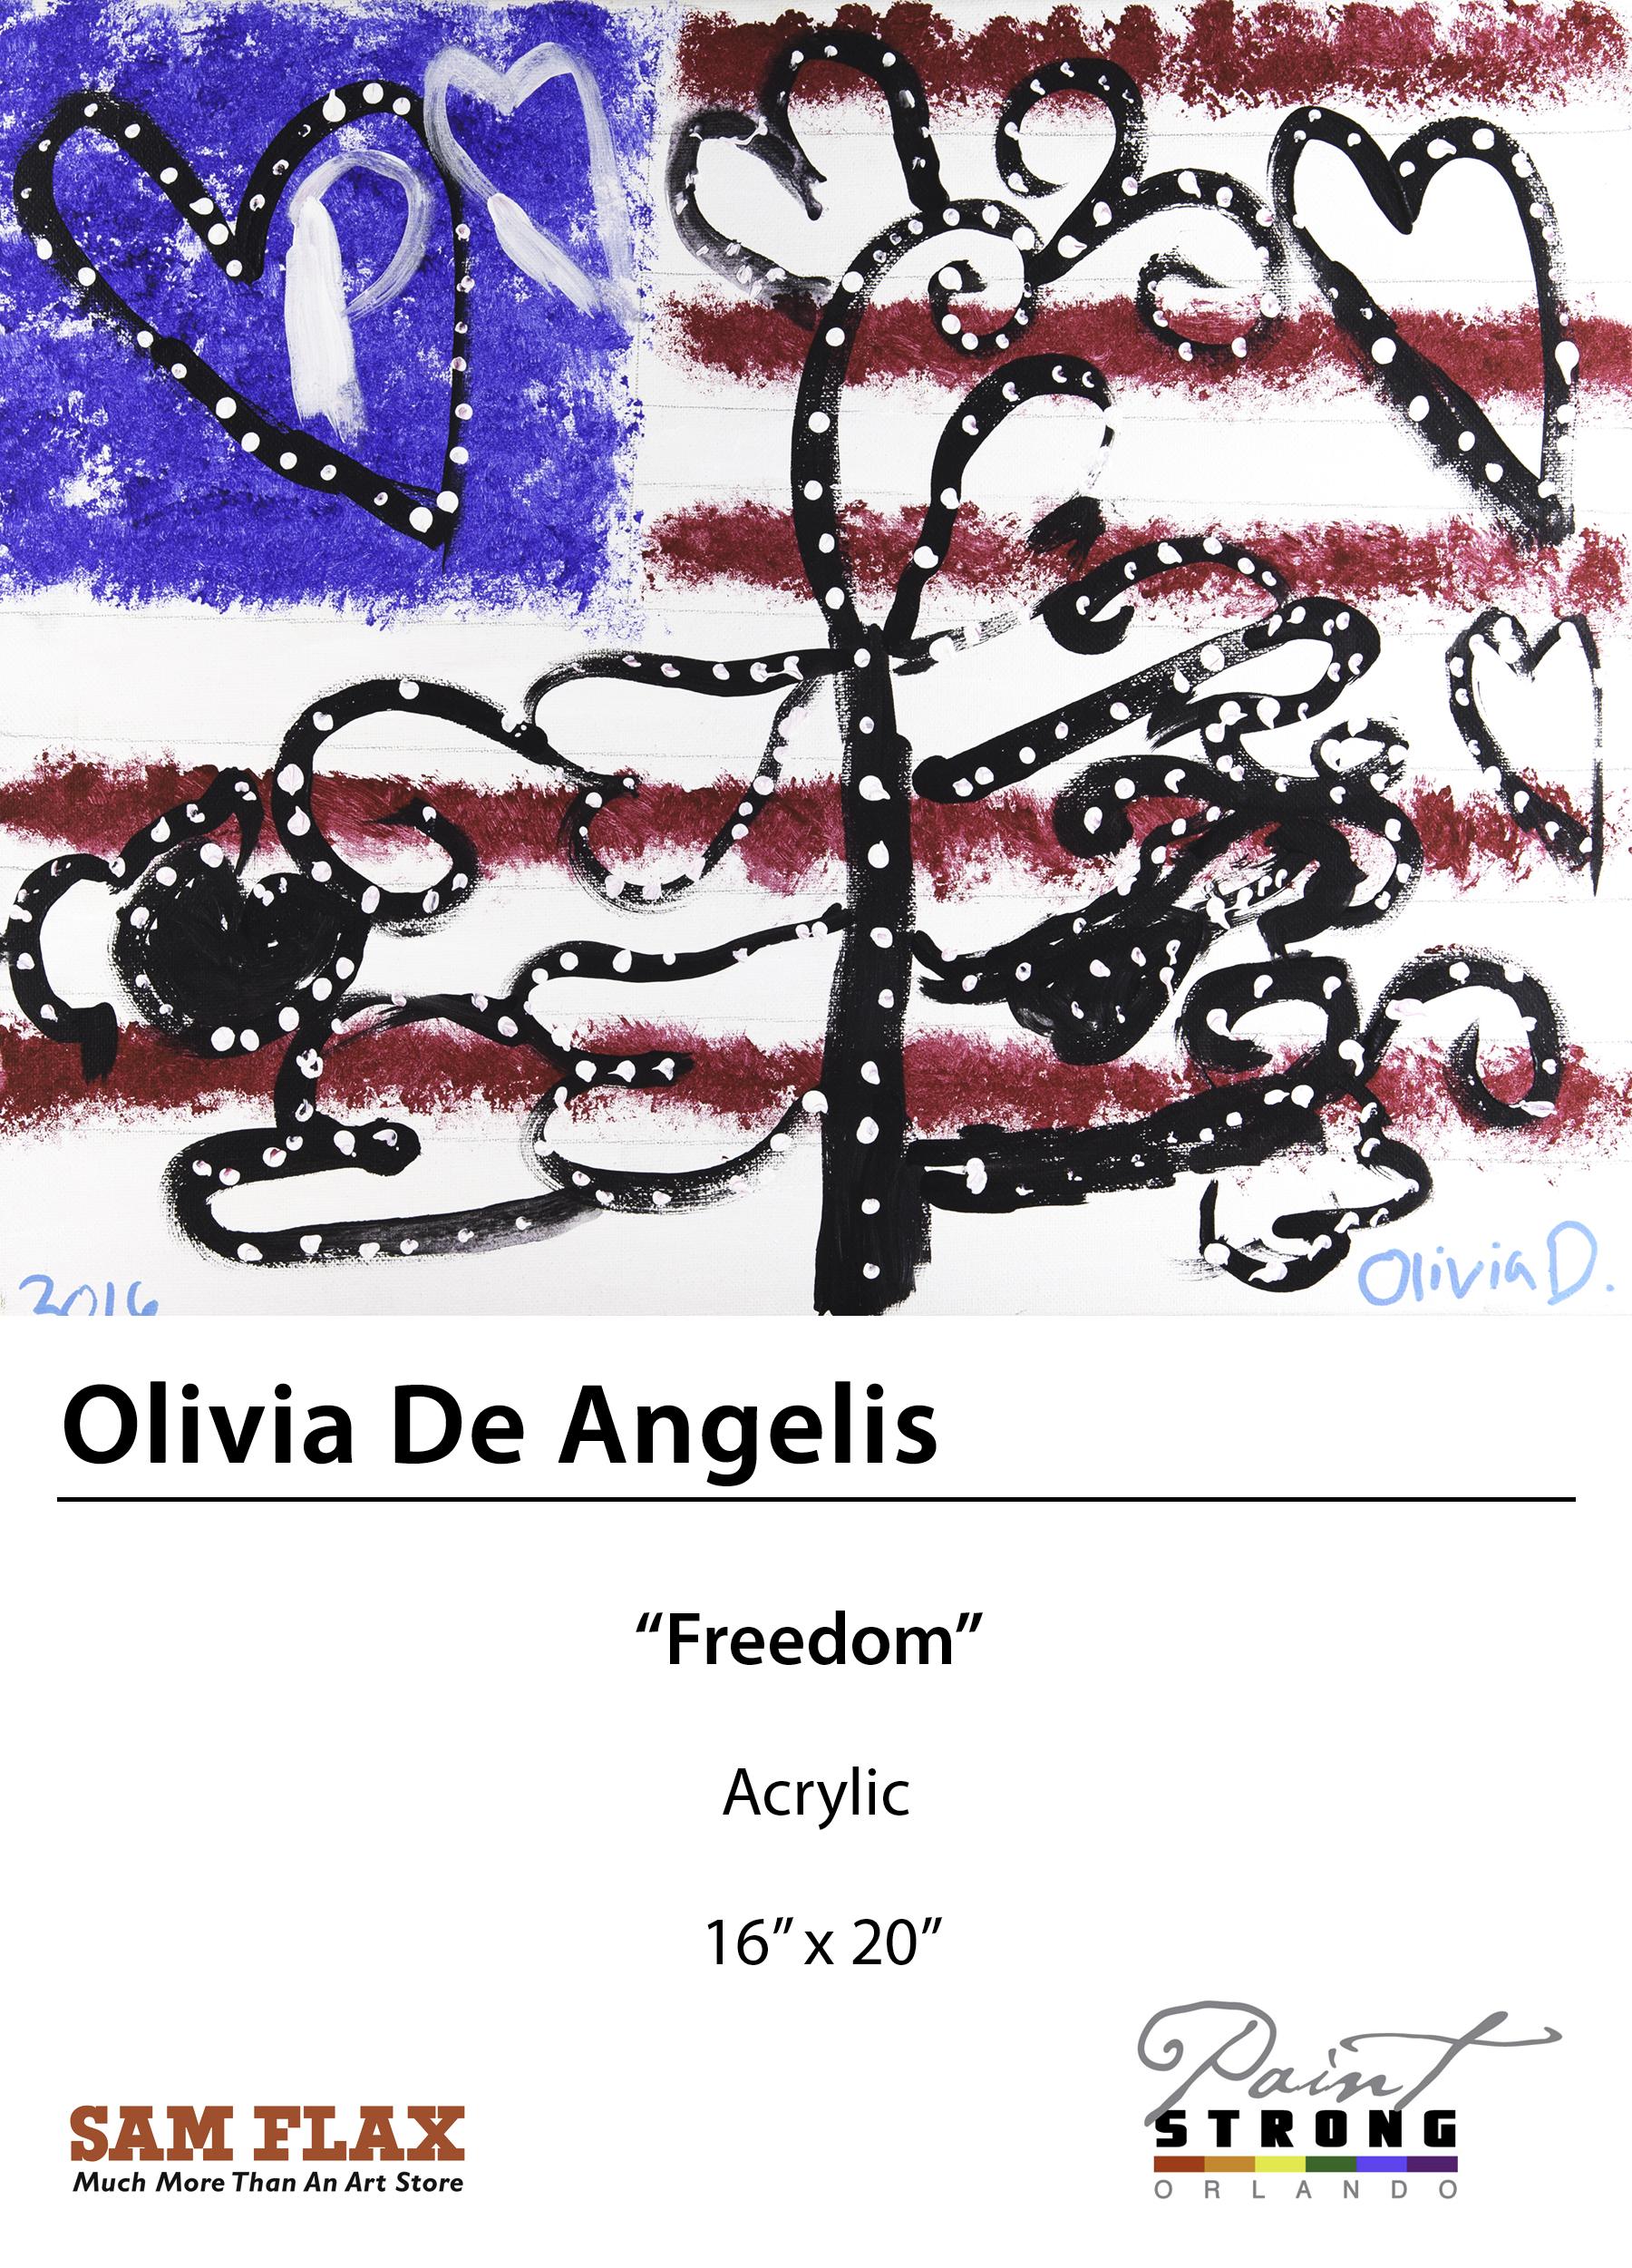 Olivia De Angelis